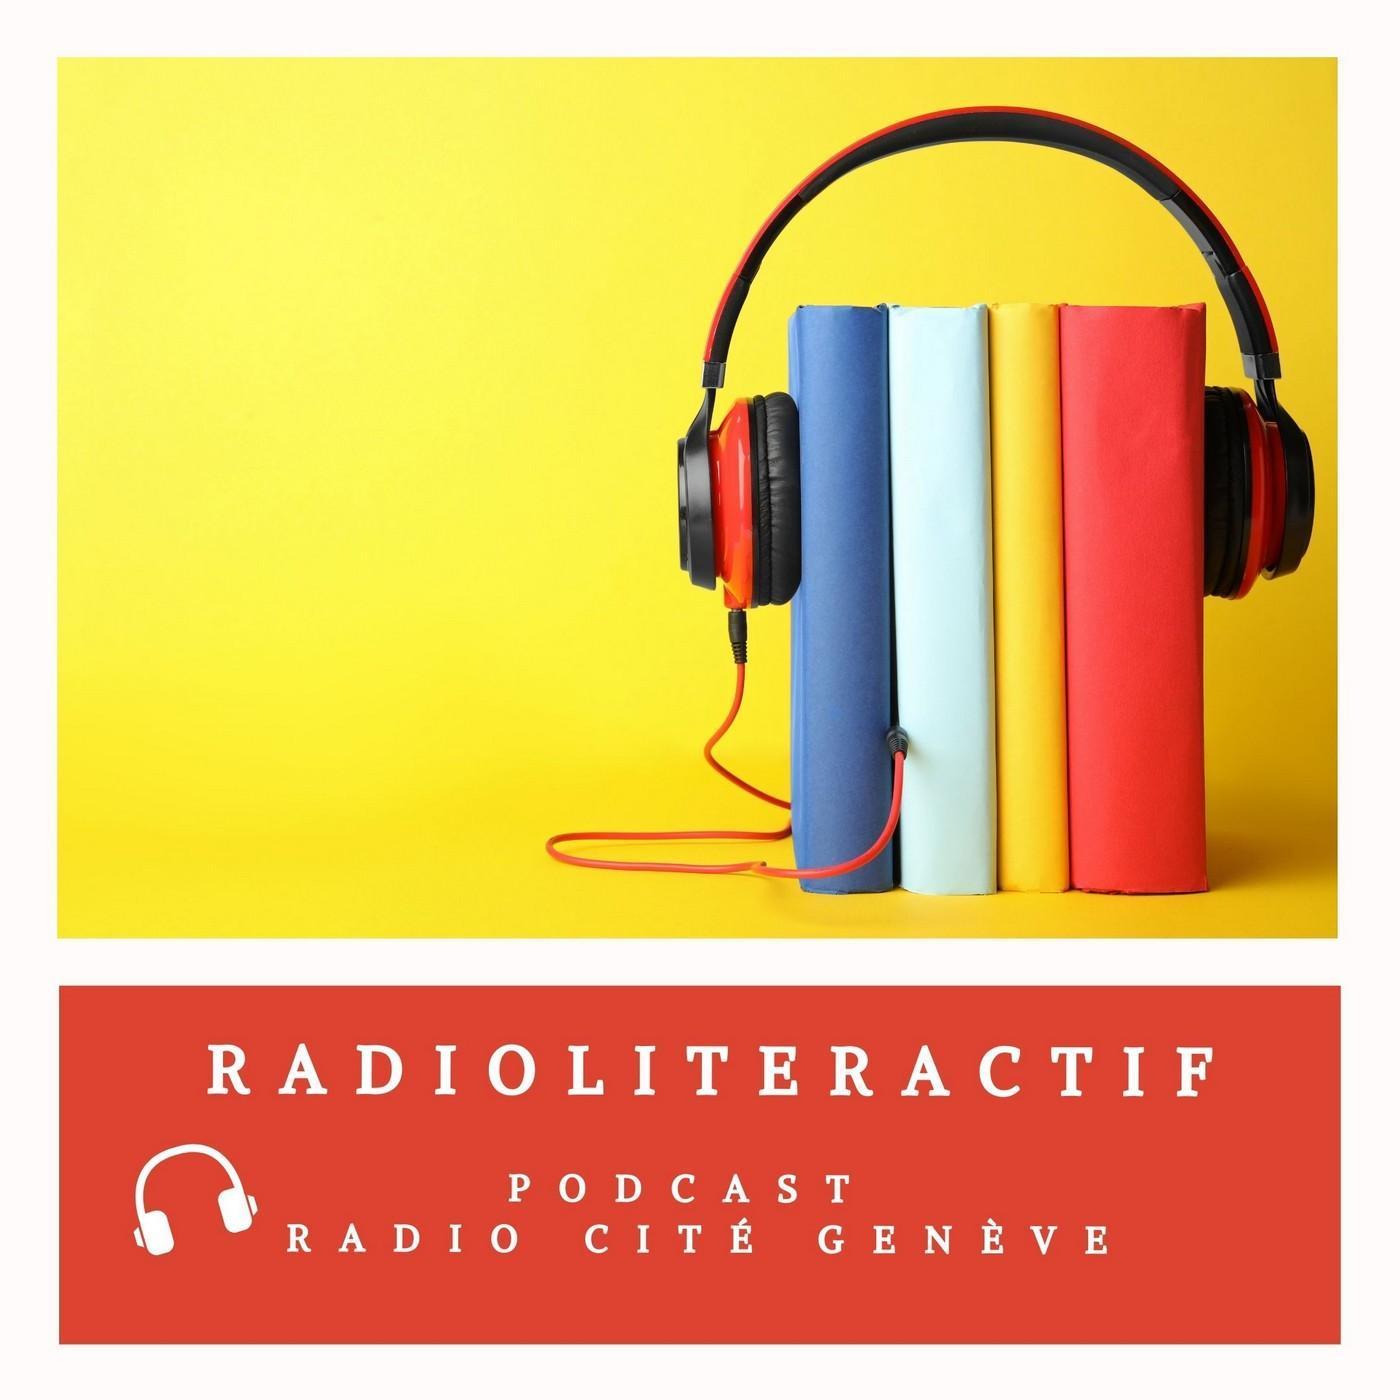 Radioliteractif du 19/04/2021 -Daniel de Roulet